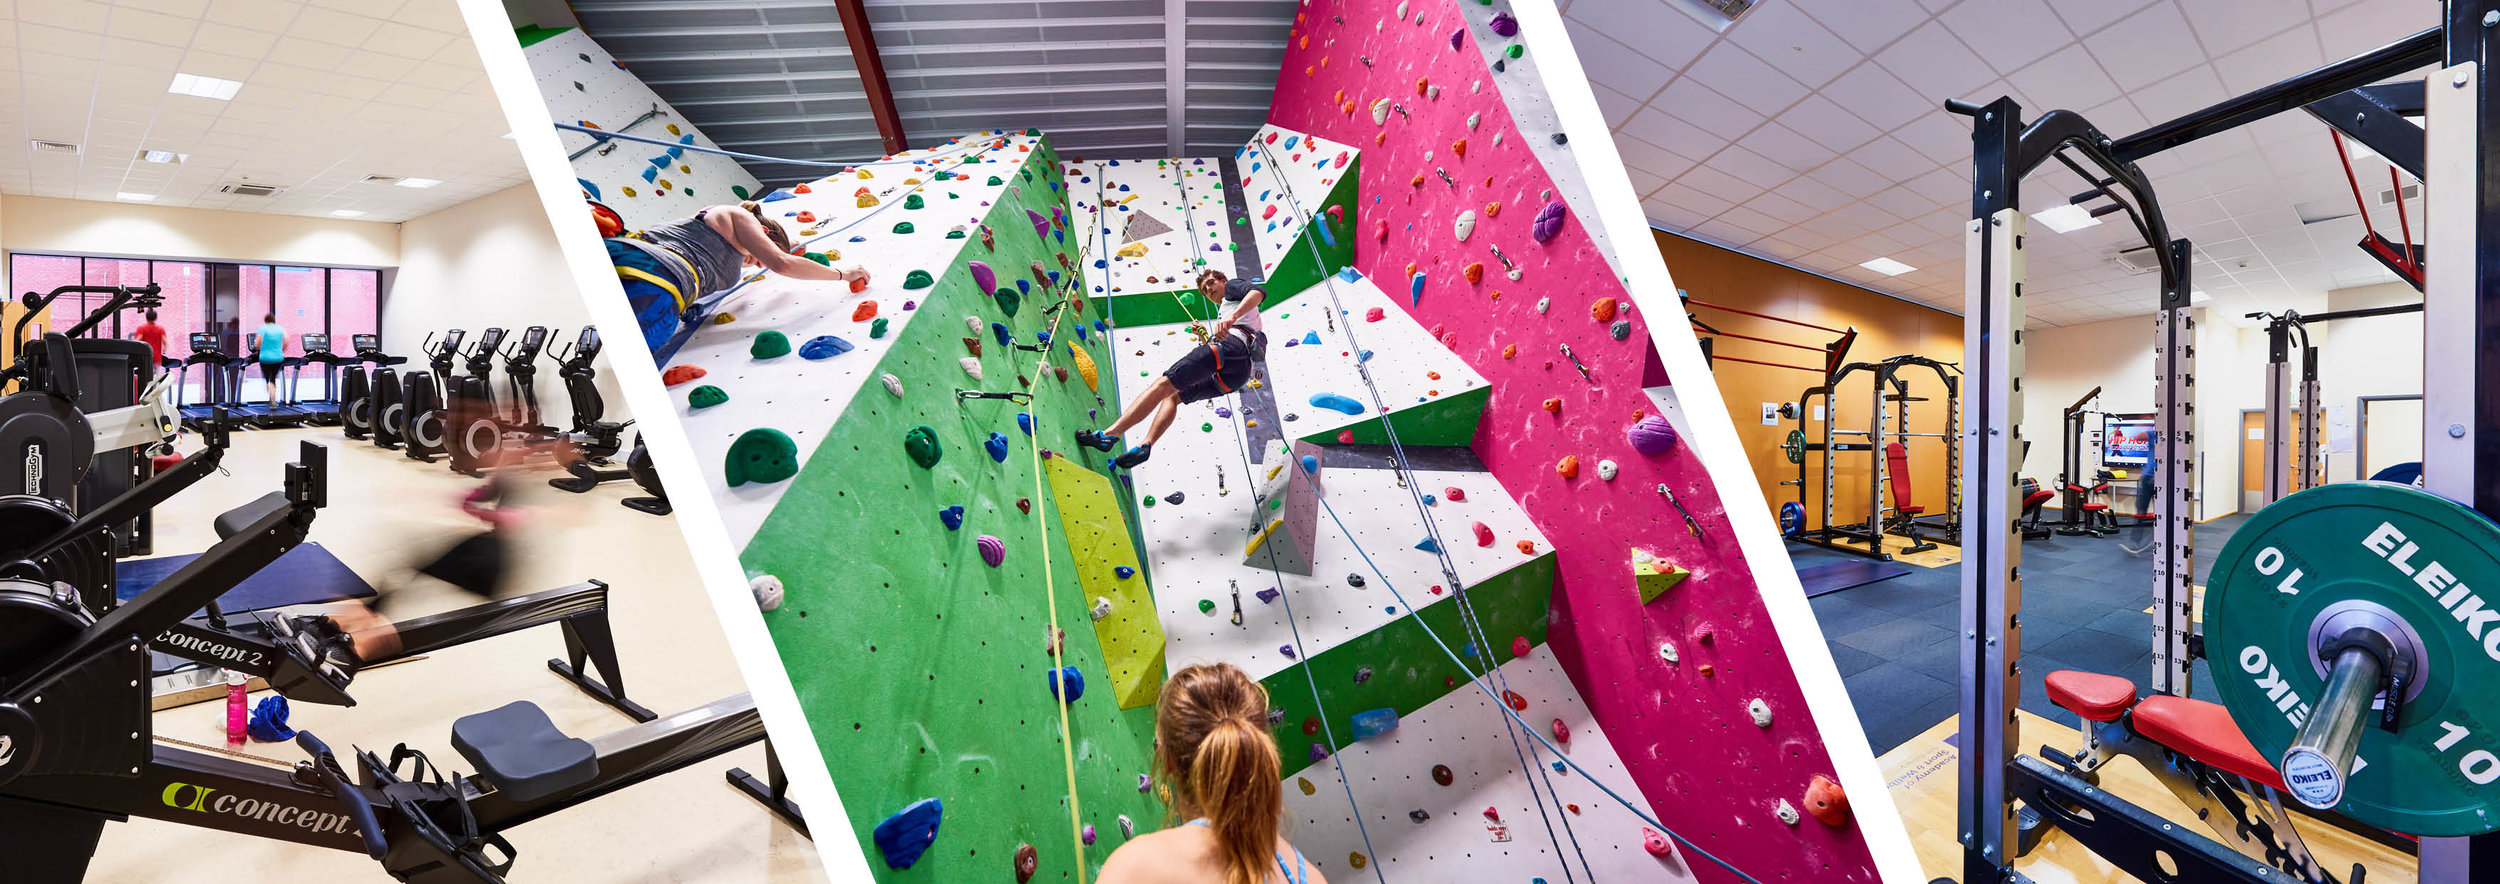 cardio-climb-lift.jpg